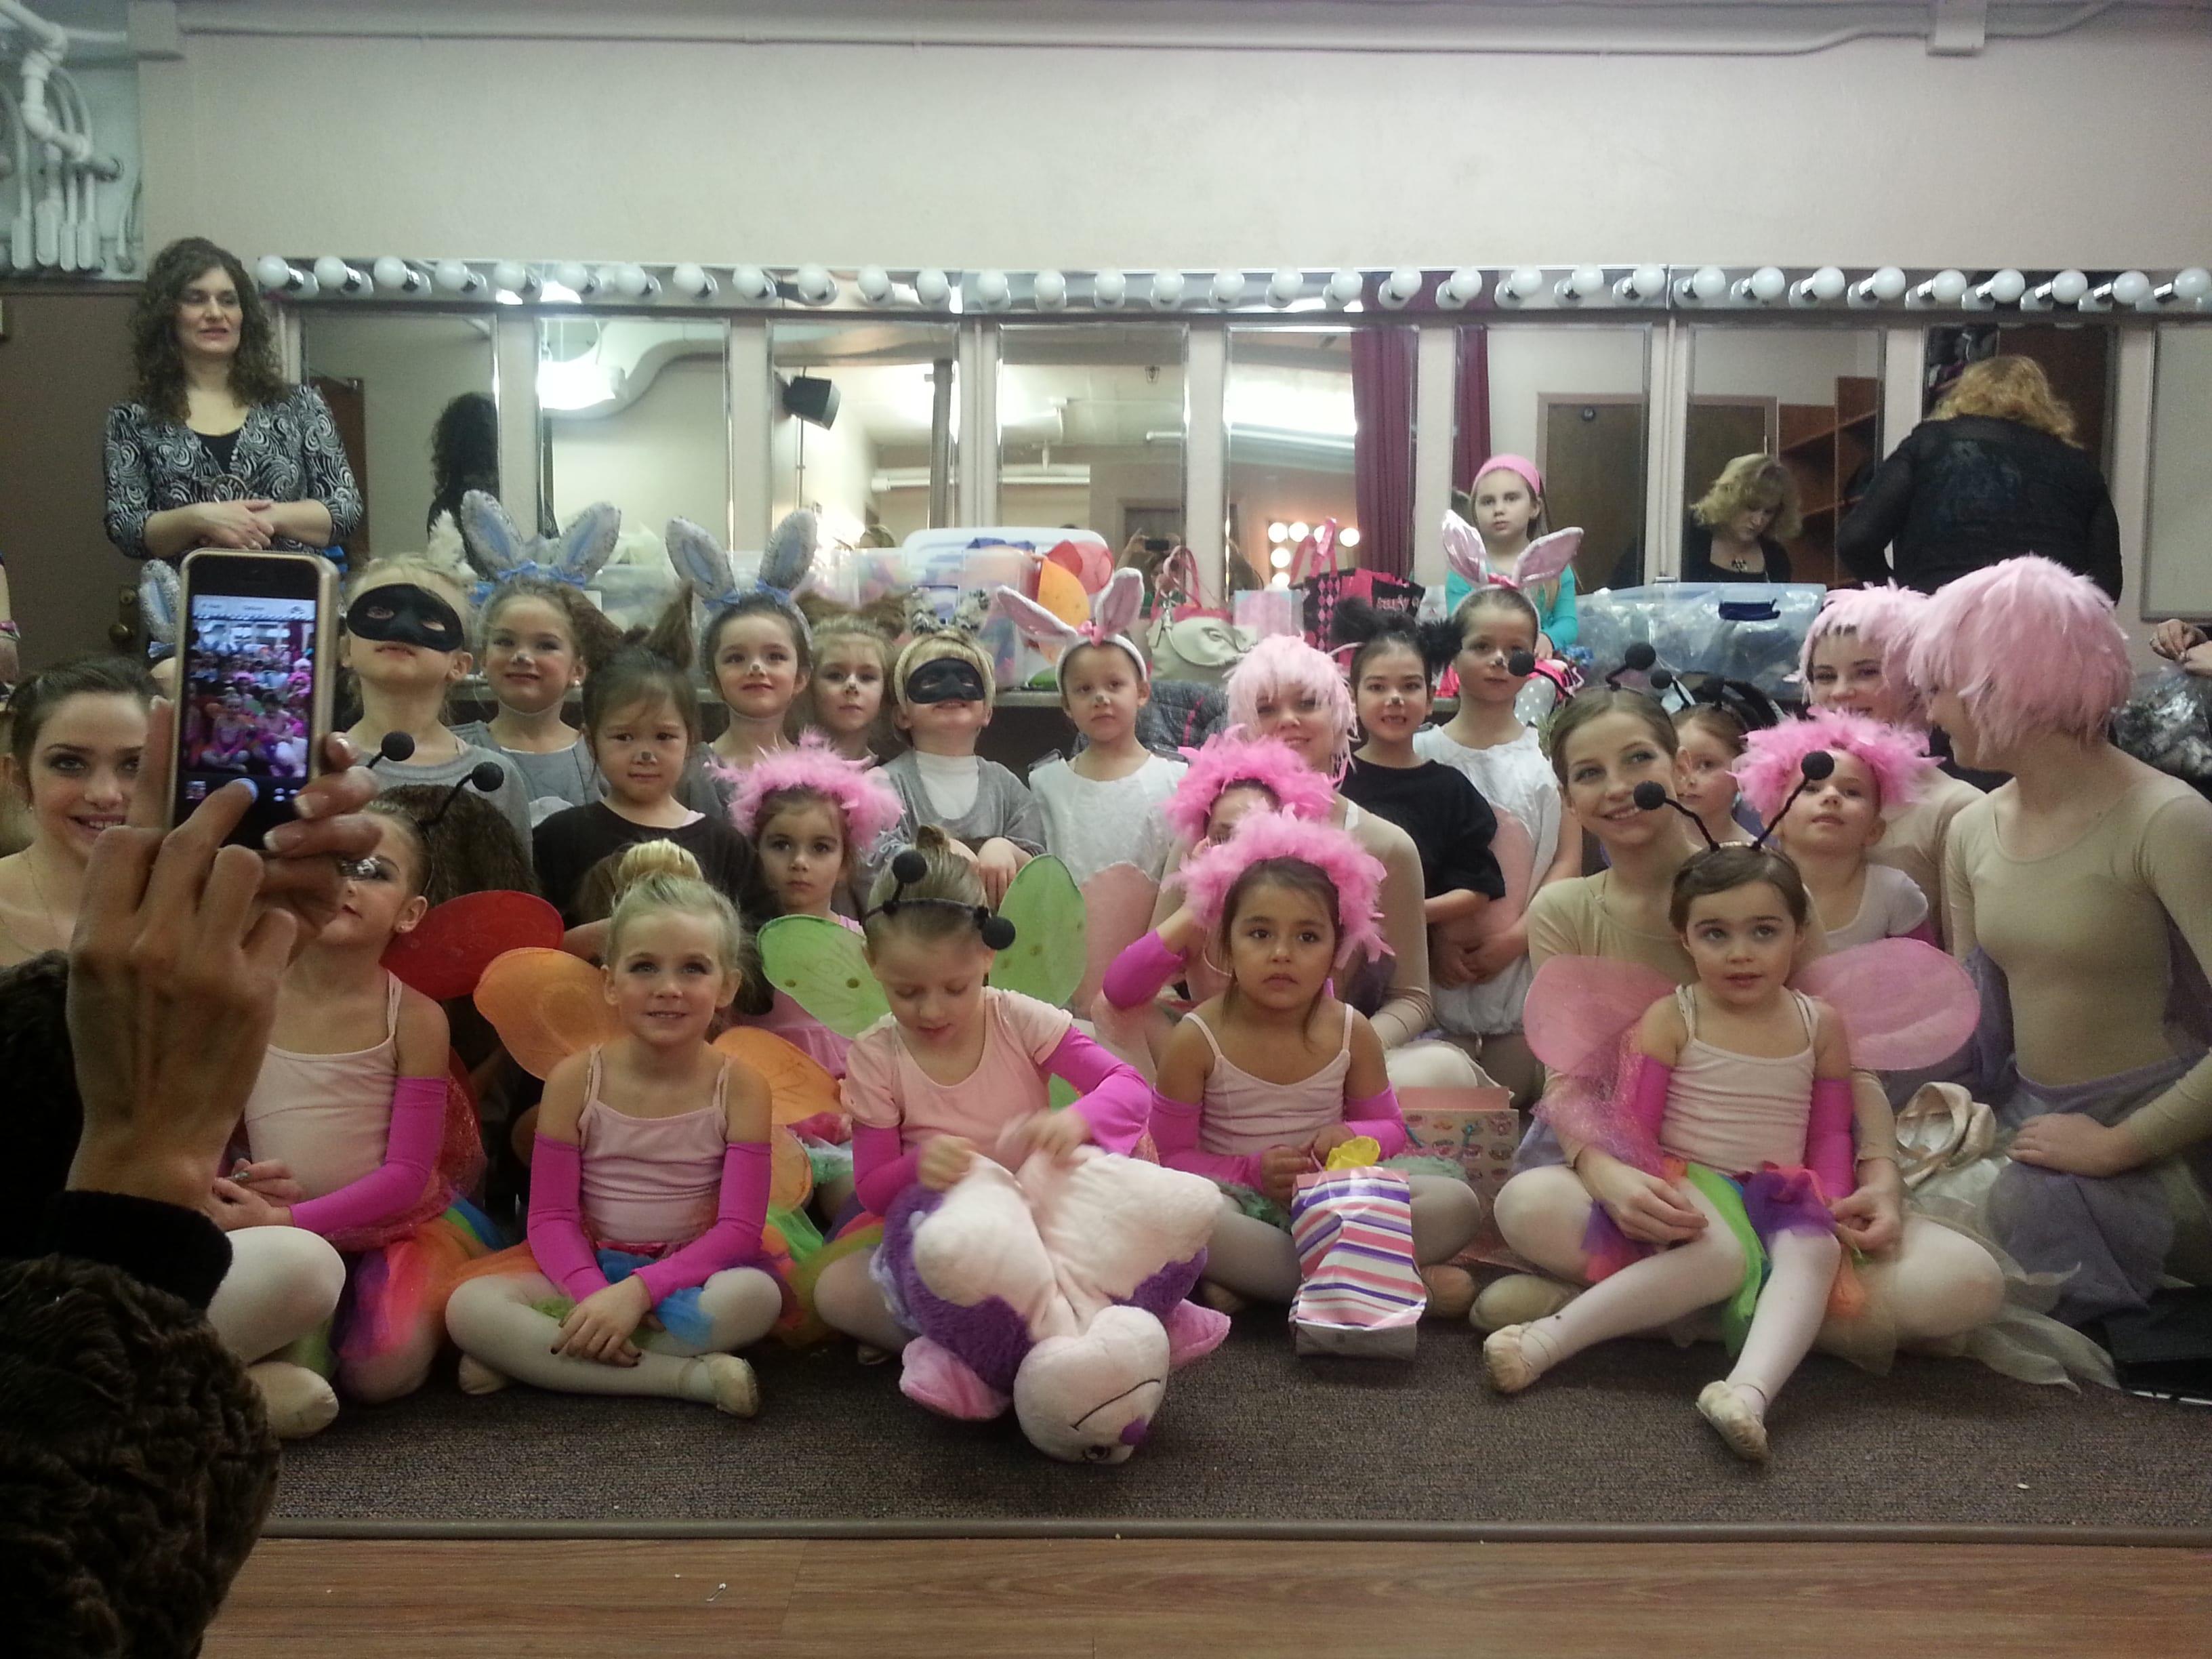 20130317_132846 – Beth Fowler School of Dance : Genoa and St. Charles Illinois